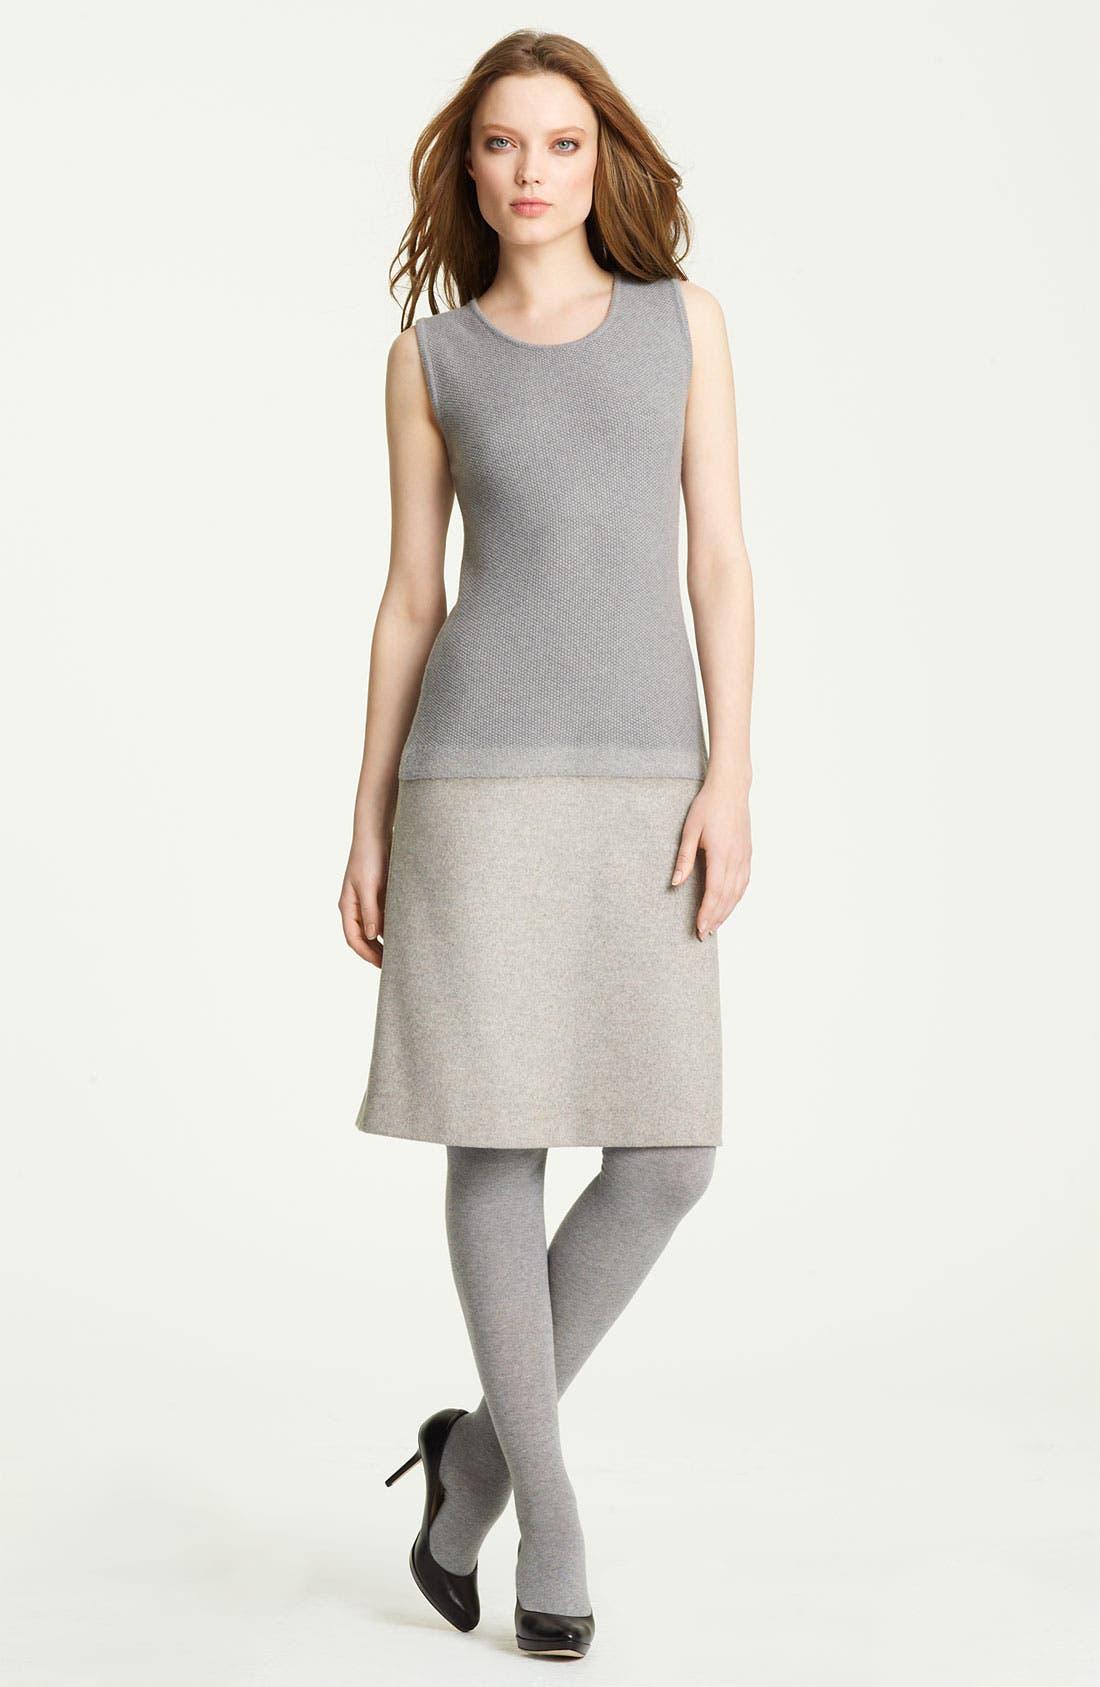 Main Image - Fabiana Filippi Knit & Felt Wool Blend Dress